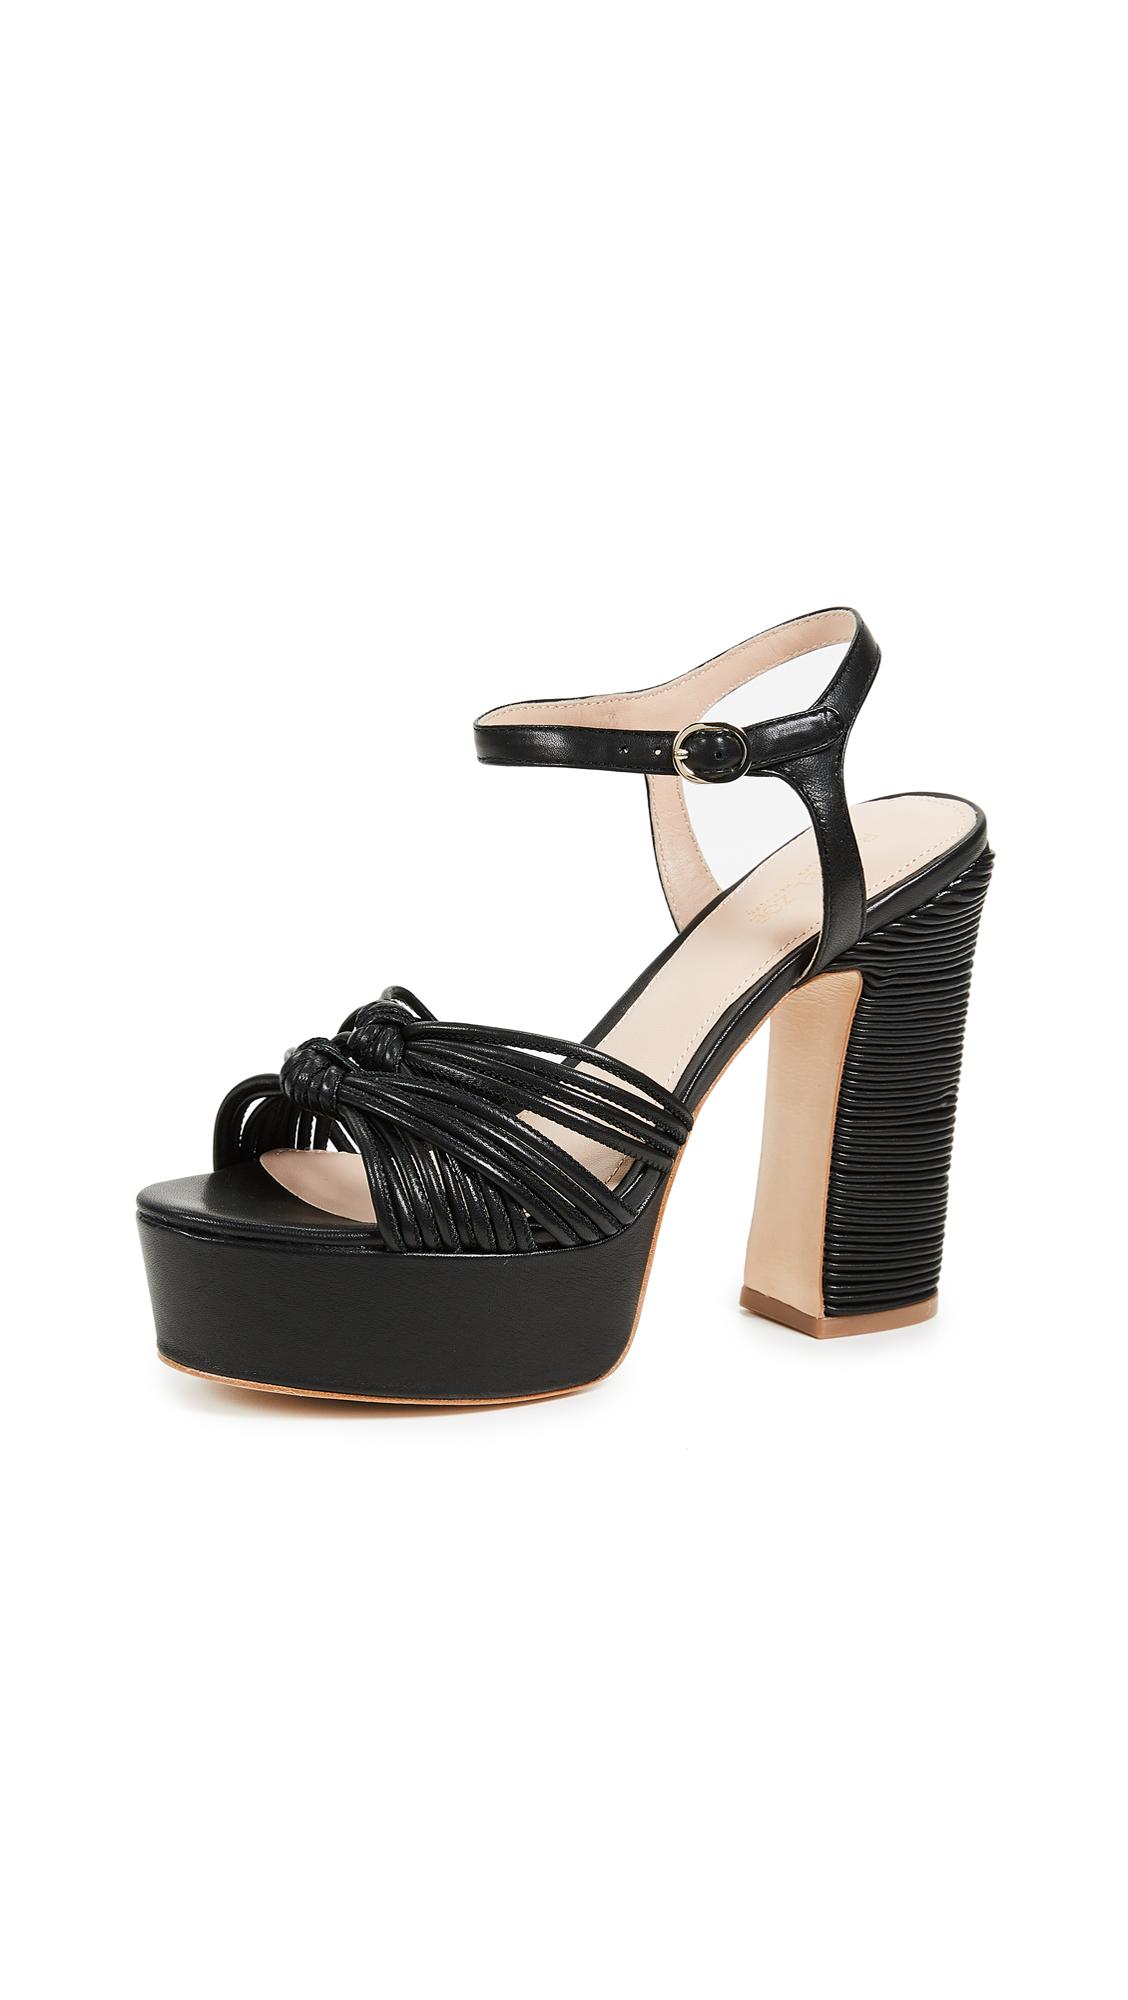 Rachel Zoe Avery Platform Sandals - Black